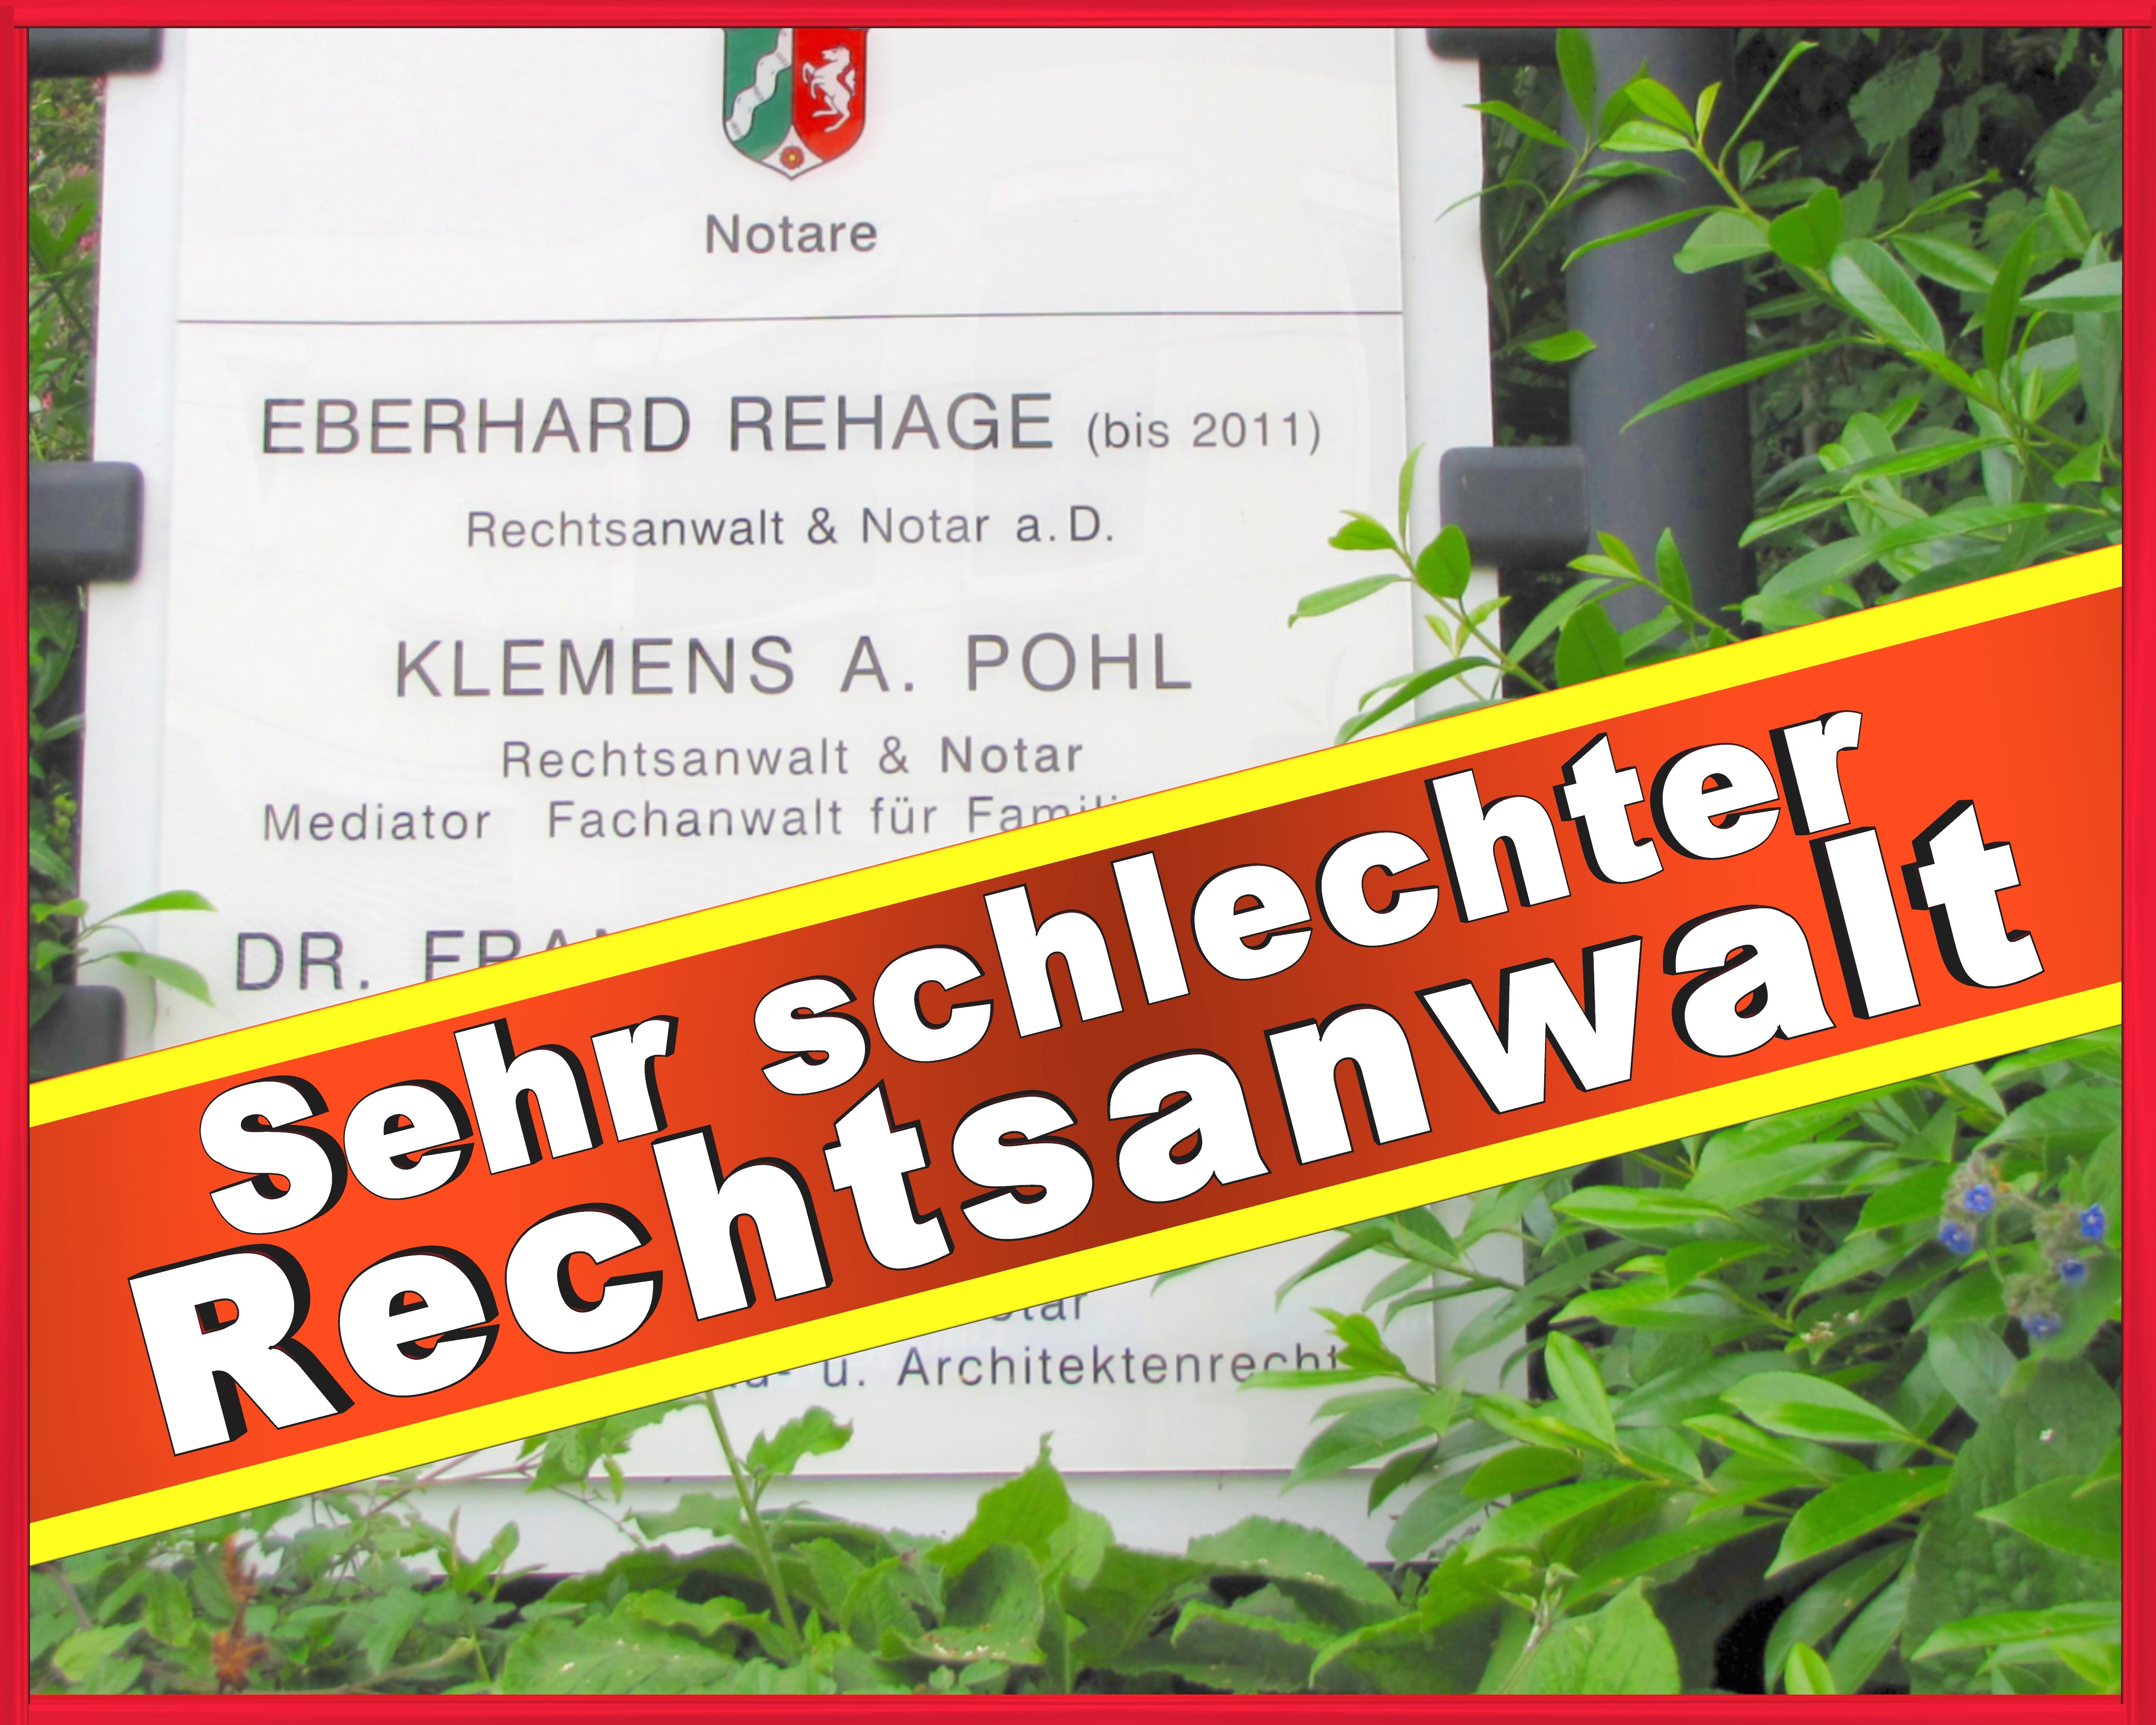 Rechtsanwalt Klemens Pohl Bielefeld